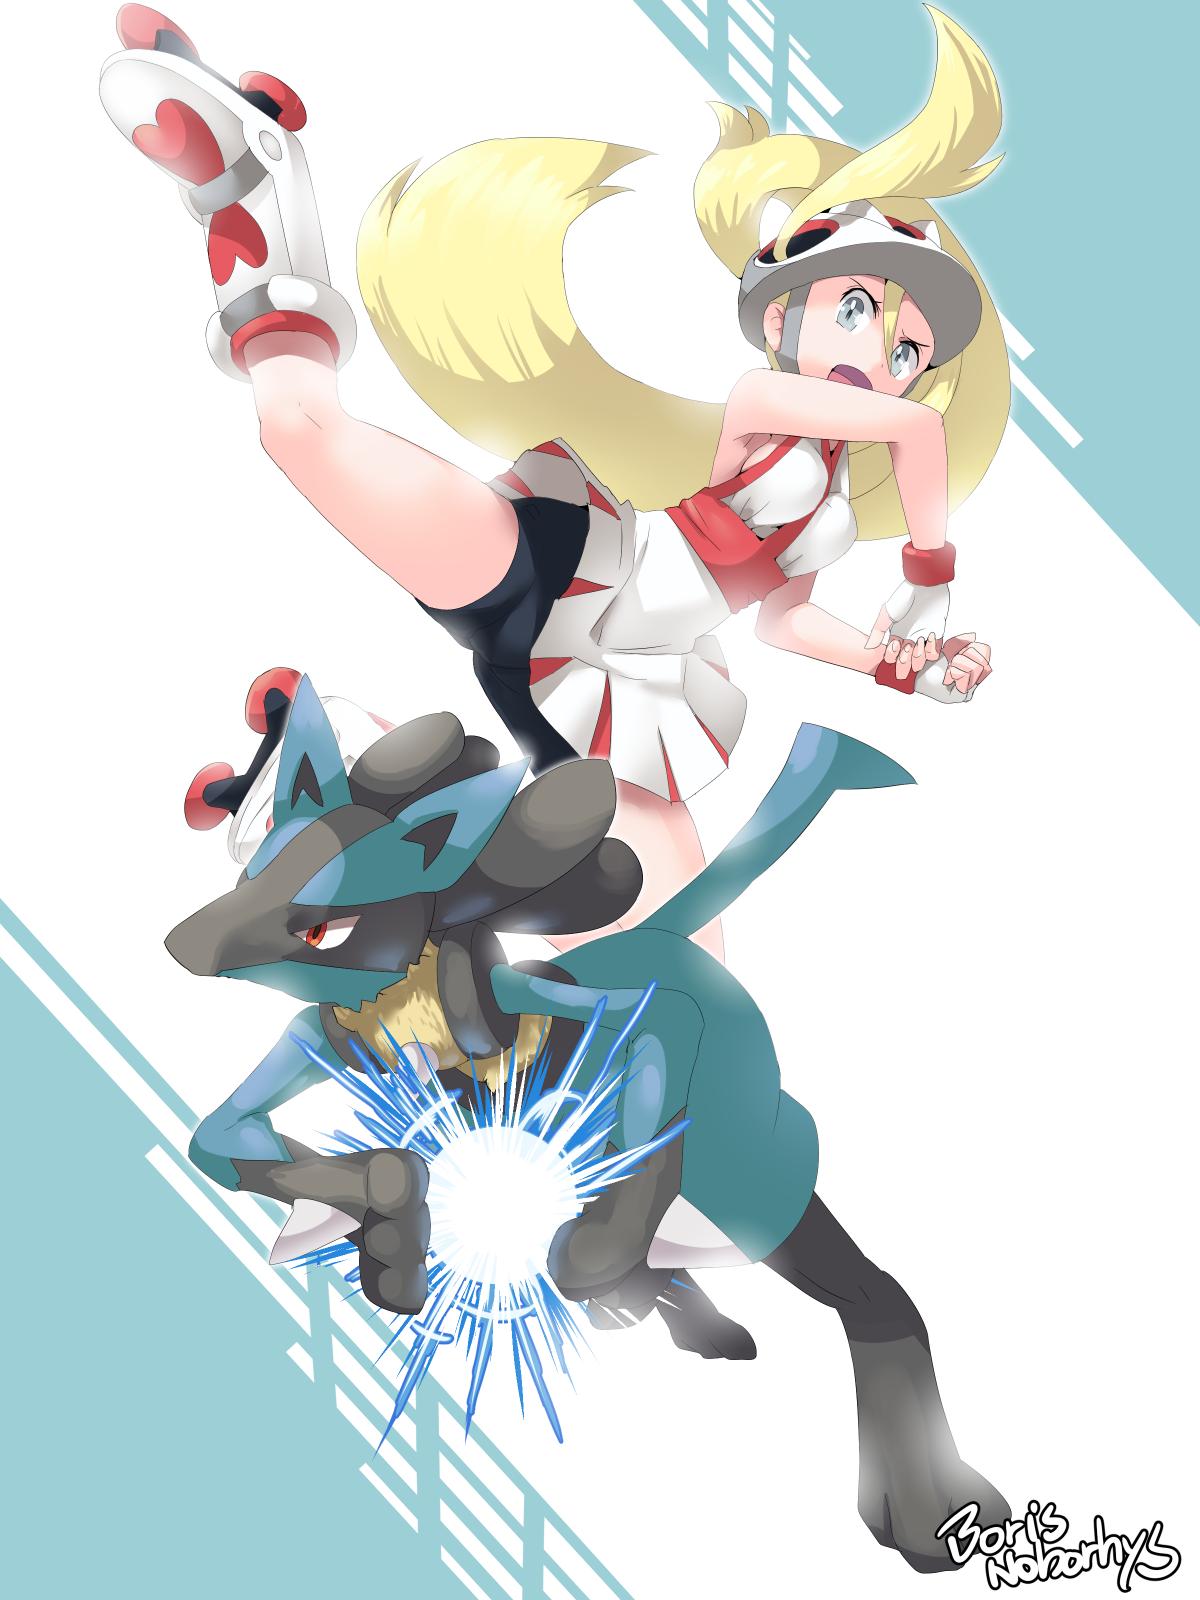 lillie (pokemon and 2 more) drawn by boris_(noborhys